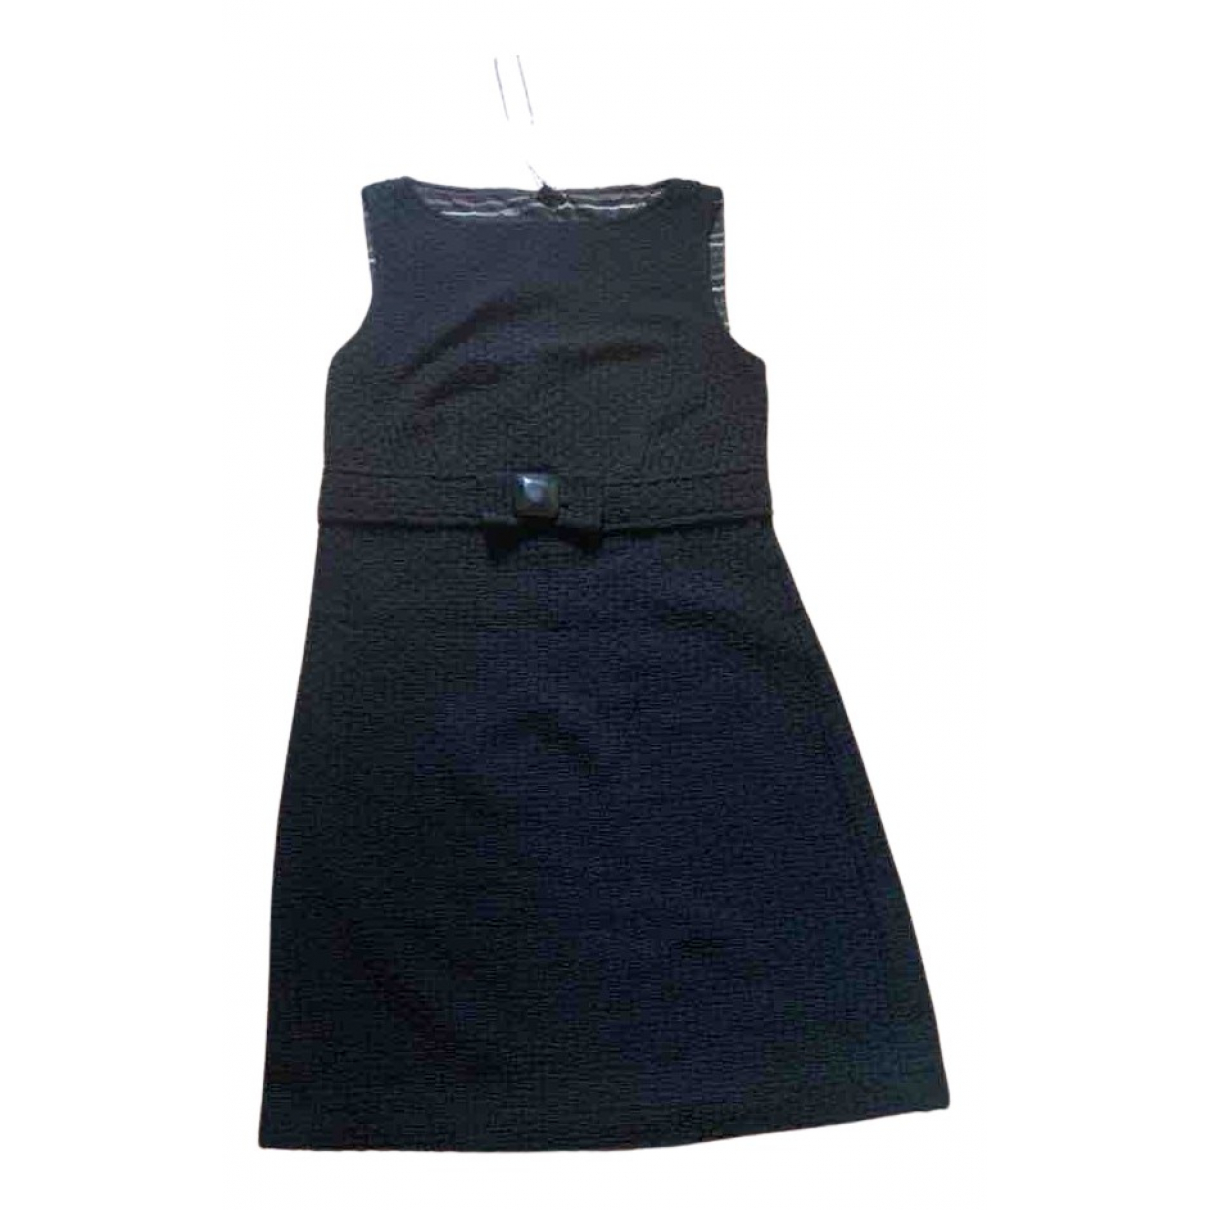 Maliparmi \N Kleid in  Schwarz Baumwolle